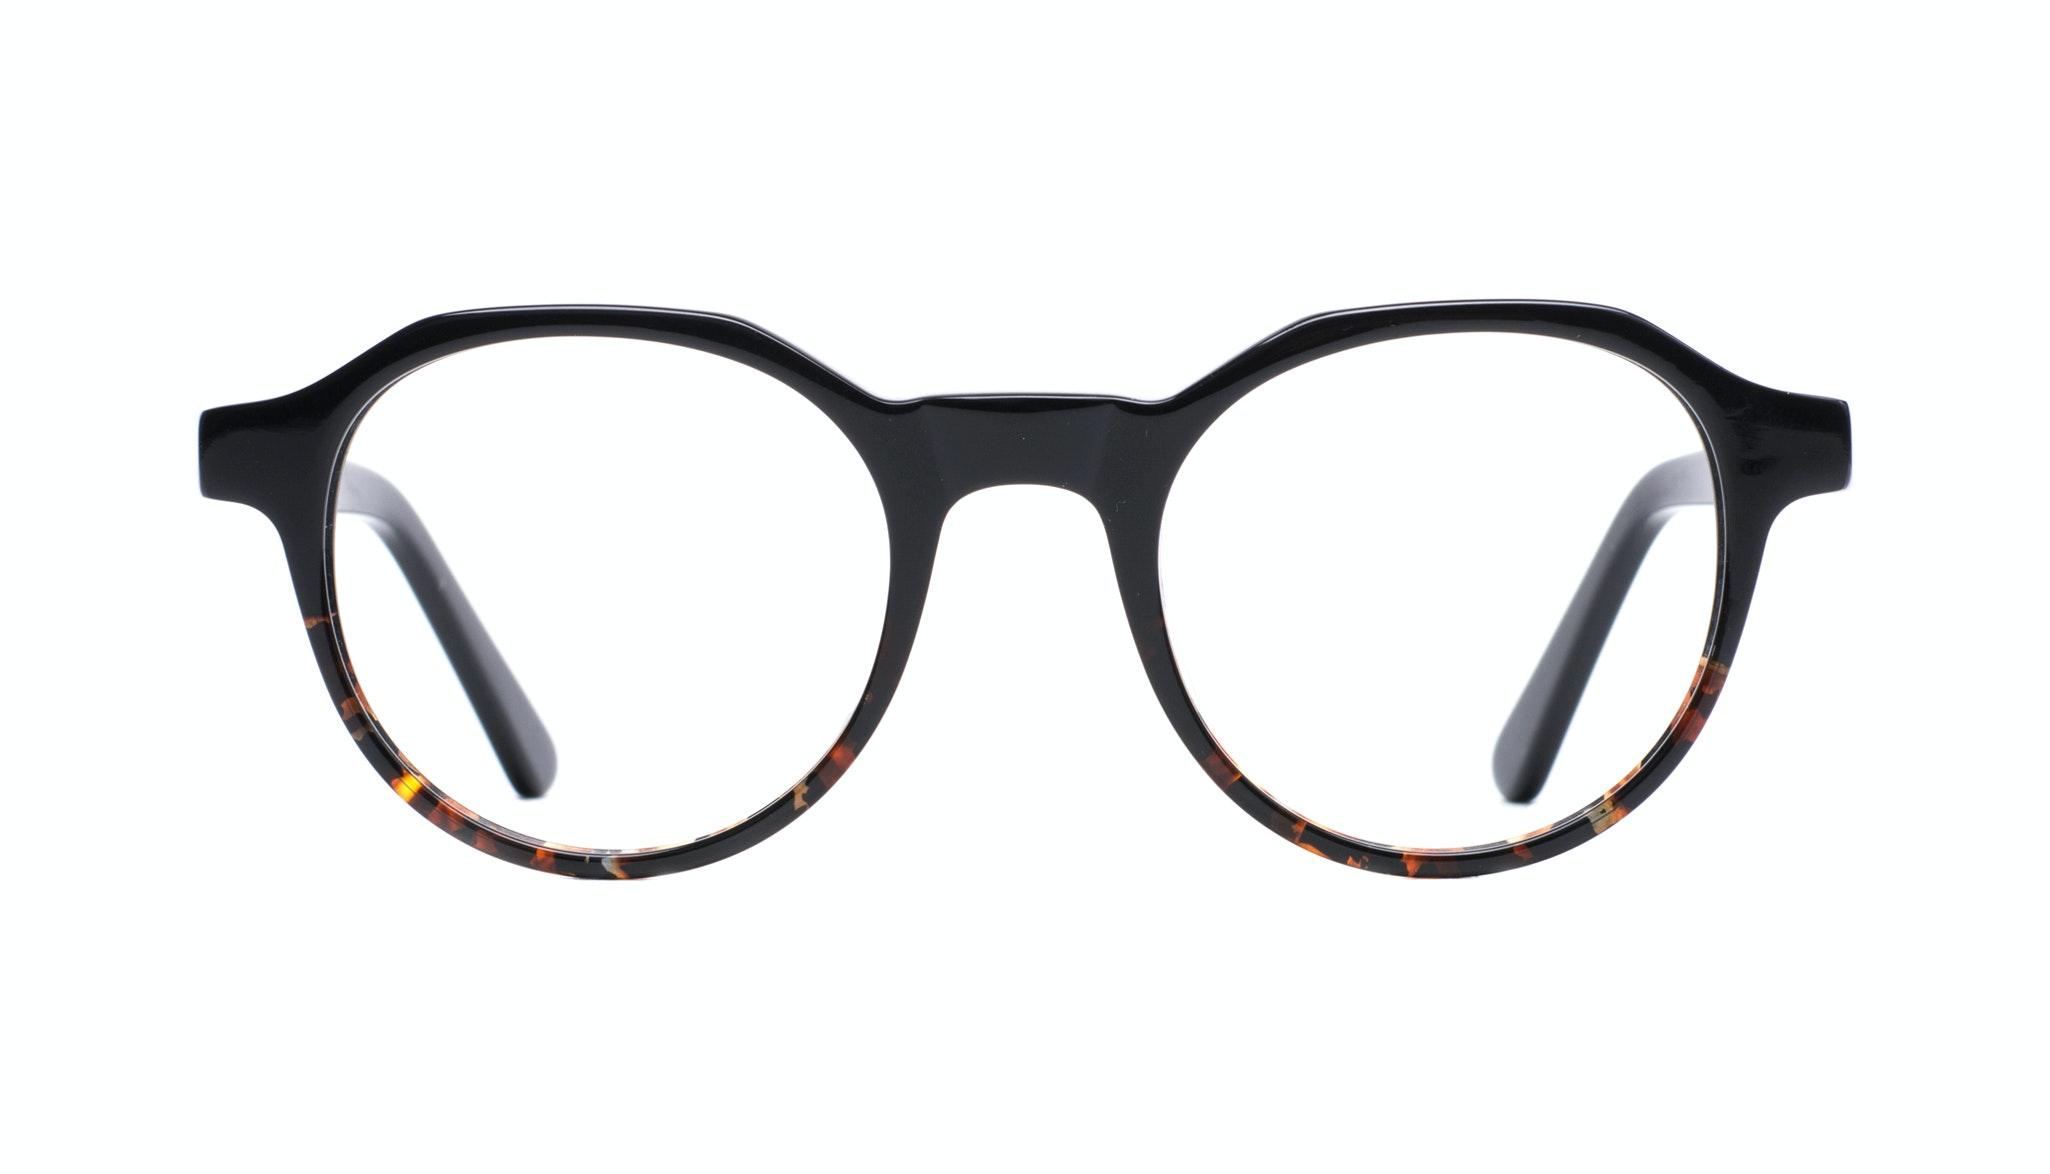 Affordable Fashion Glasses Round Eyeglasses Men Form Black Mahogany